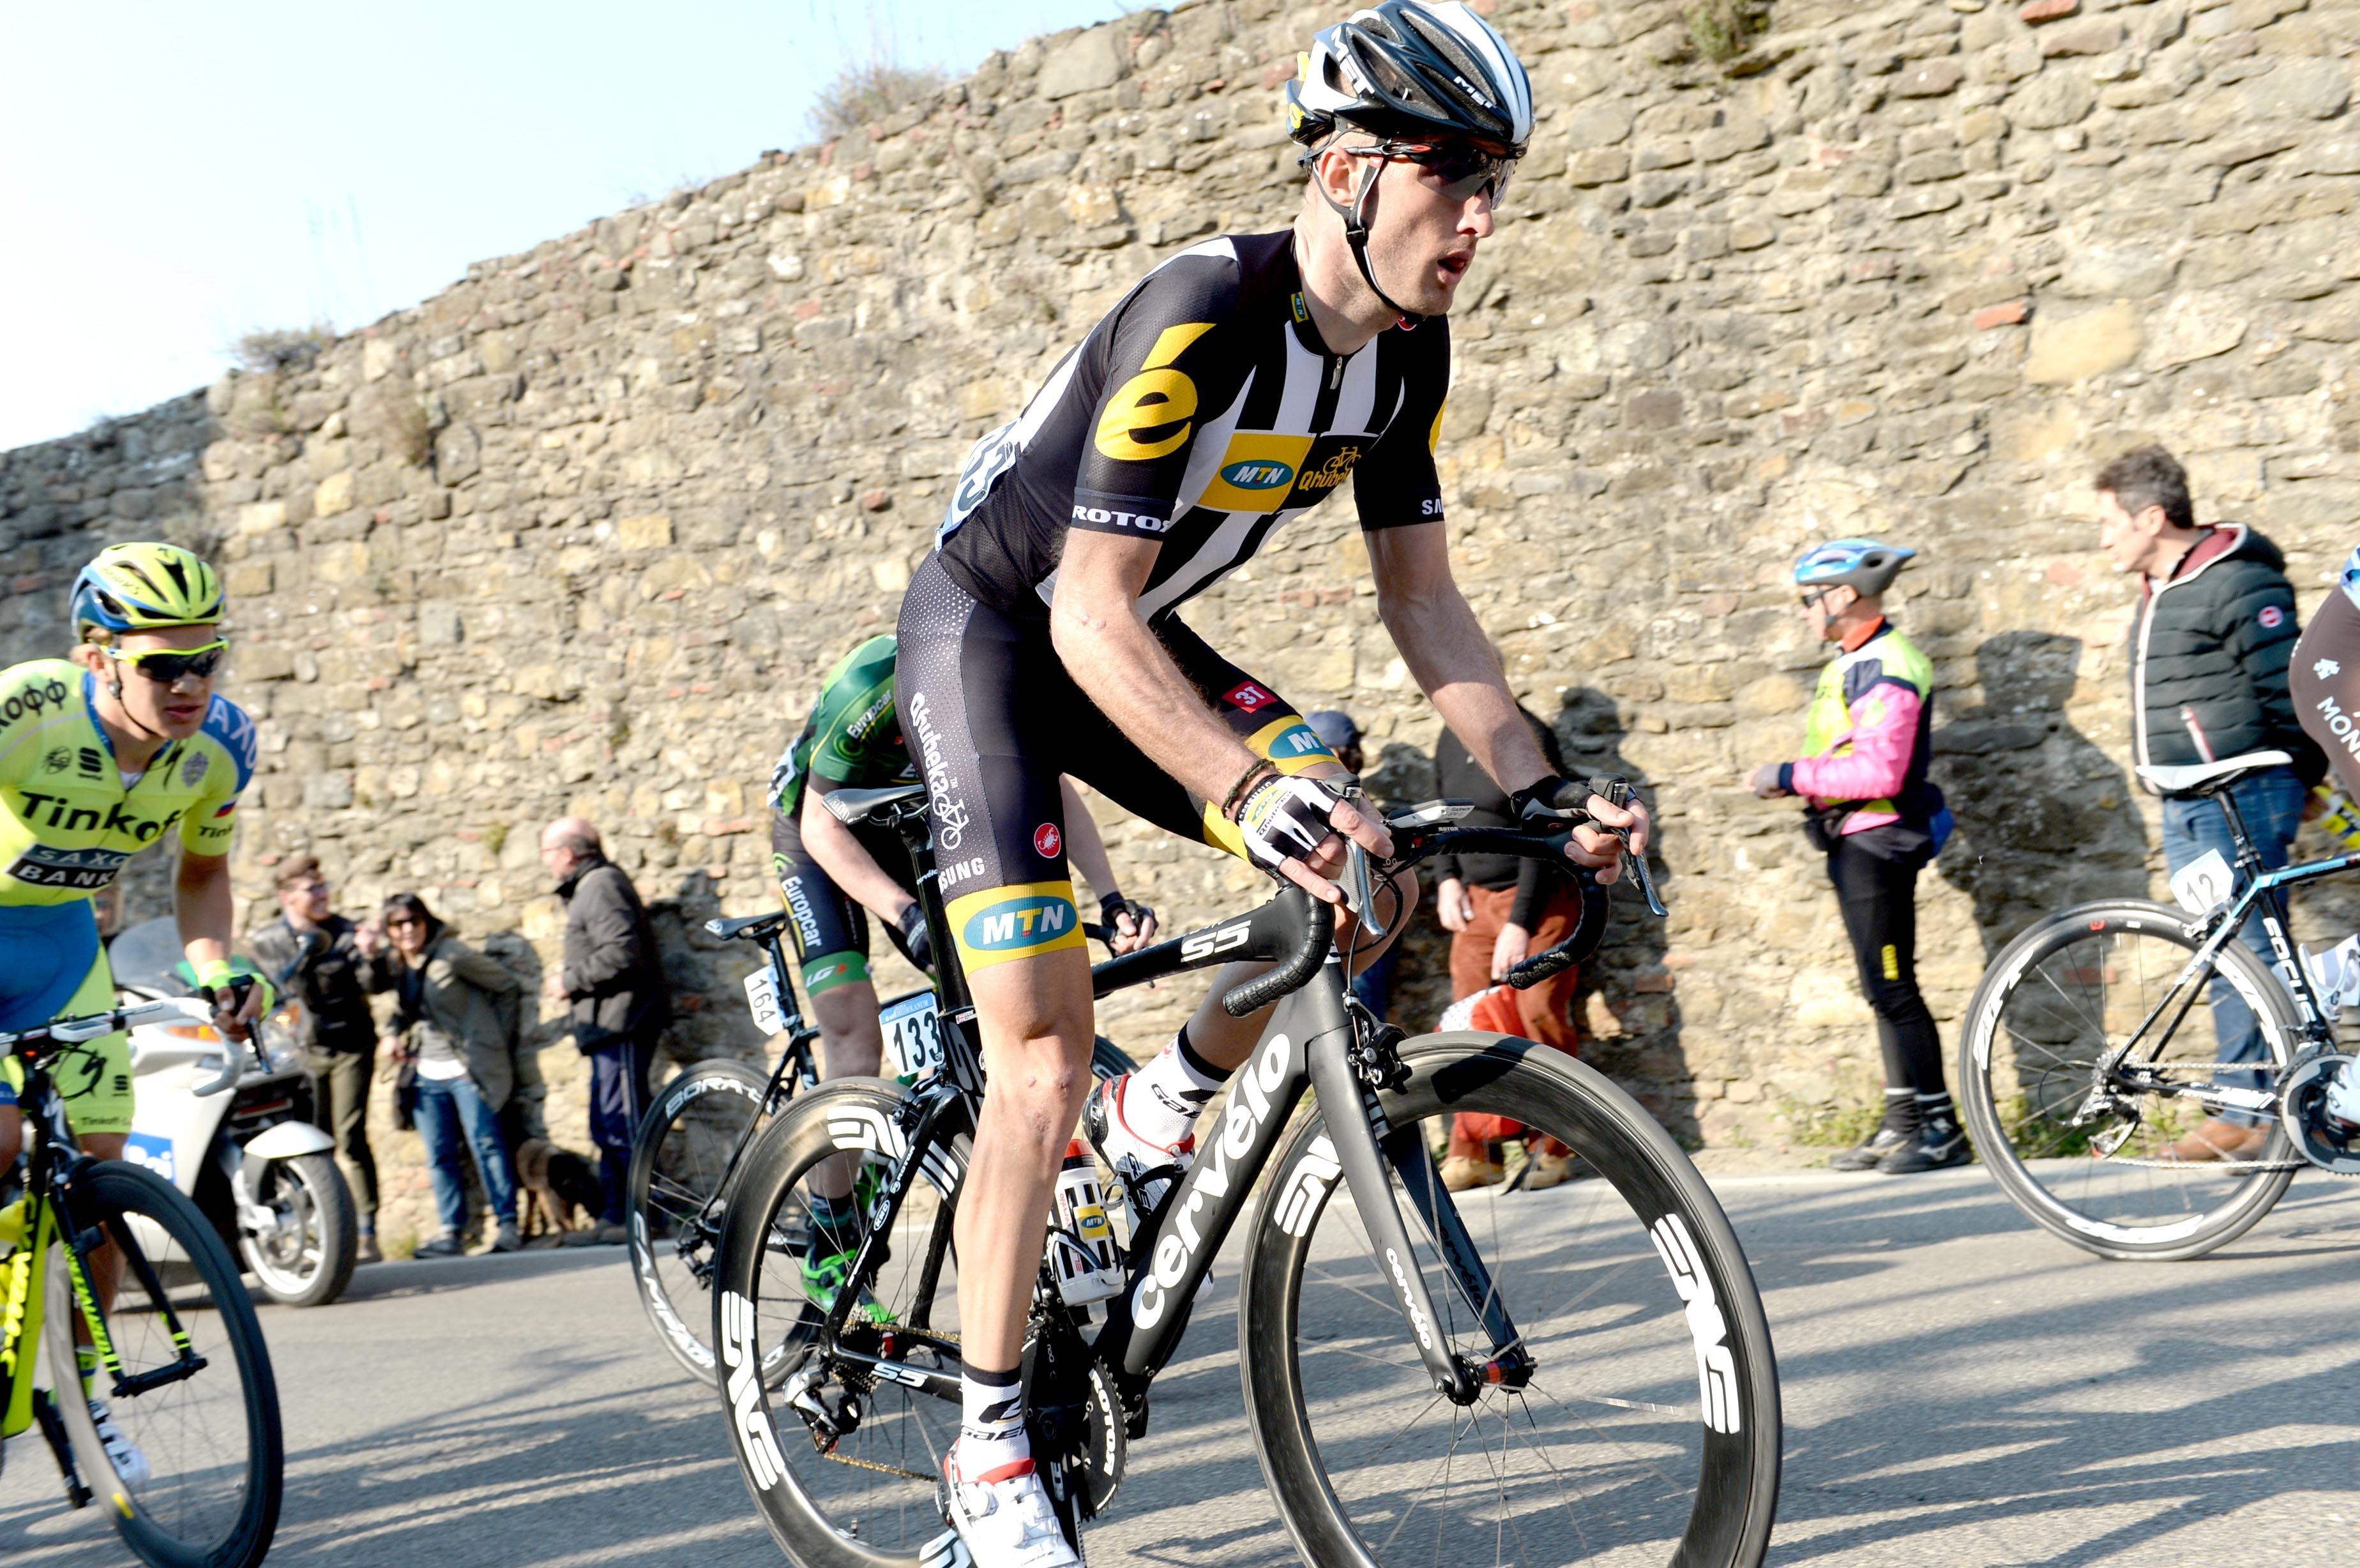 Steve Cummings, MTN-Qhubeka, 2015, climbing, Tirreno-Adriatico, stage five, 2015, pic: Sirotti